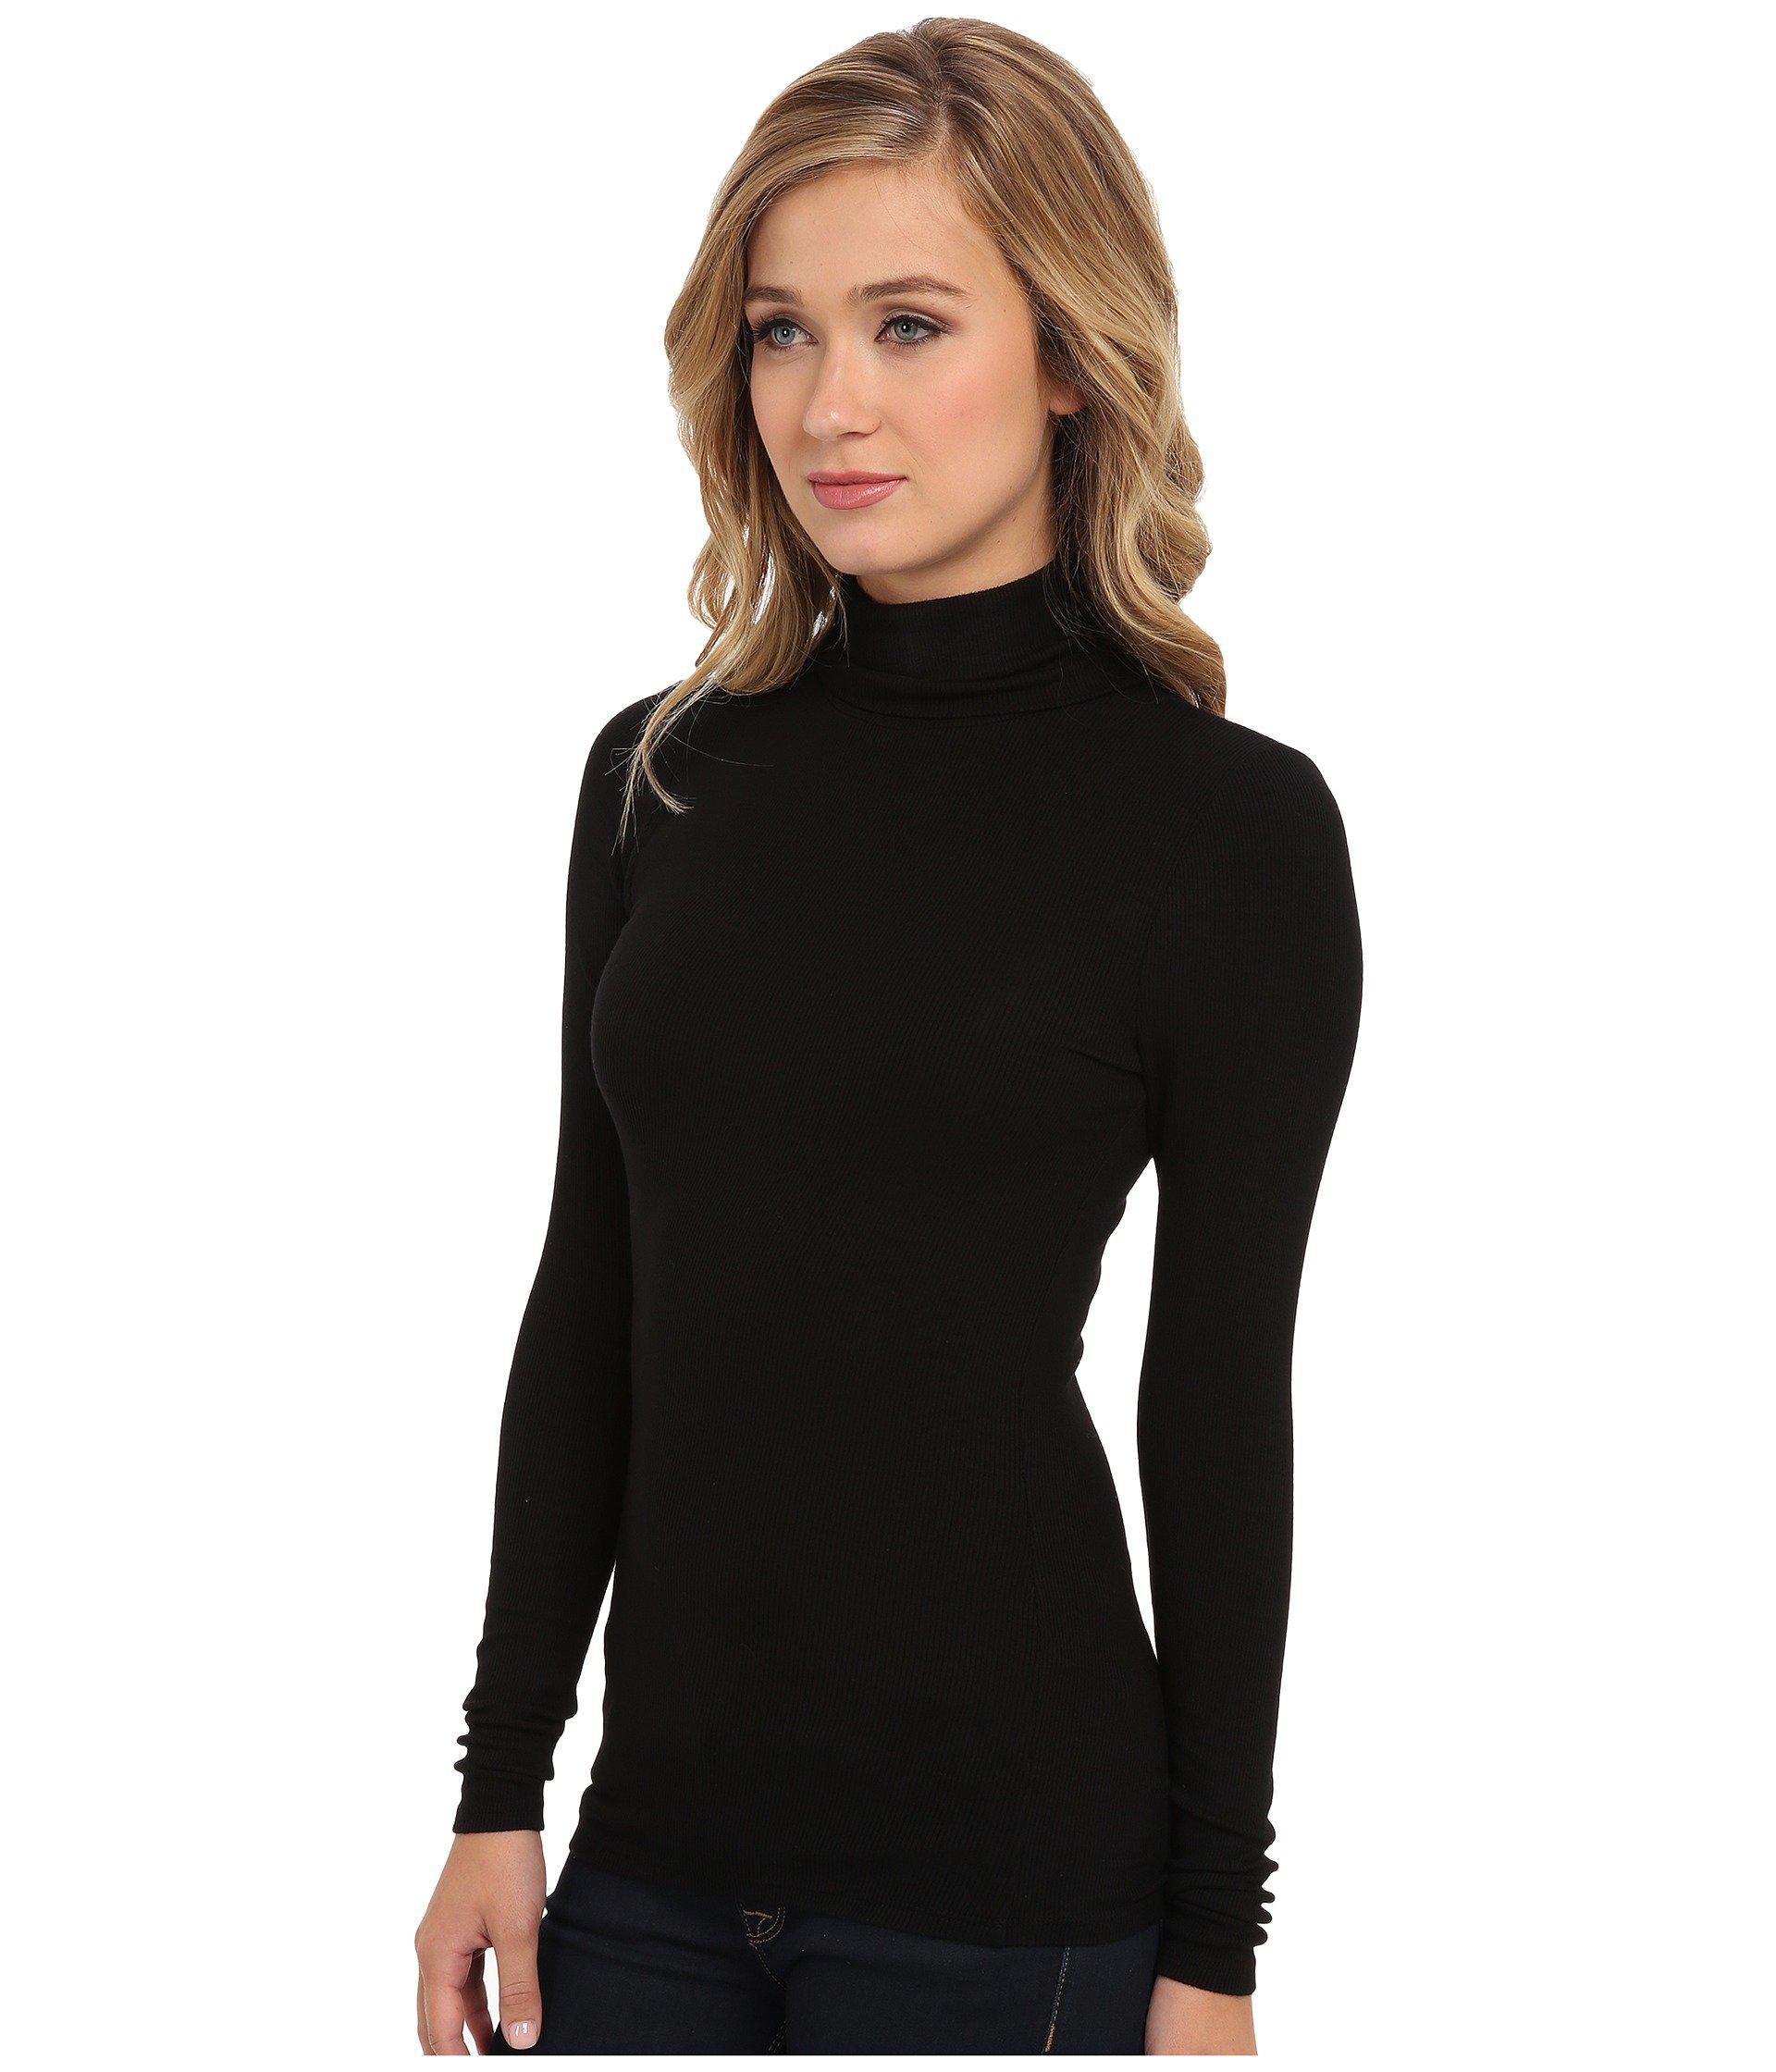 f3724243019ab Lyst - Three Dots 2x1 Viscose L s Turtleneck (black) Women s Long Sleeve  Pullover in Black